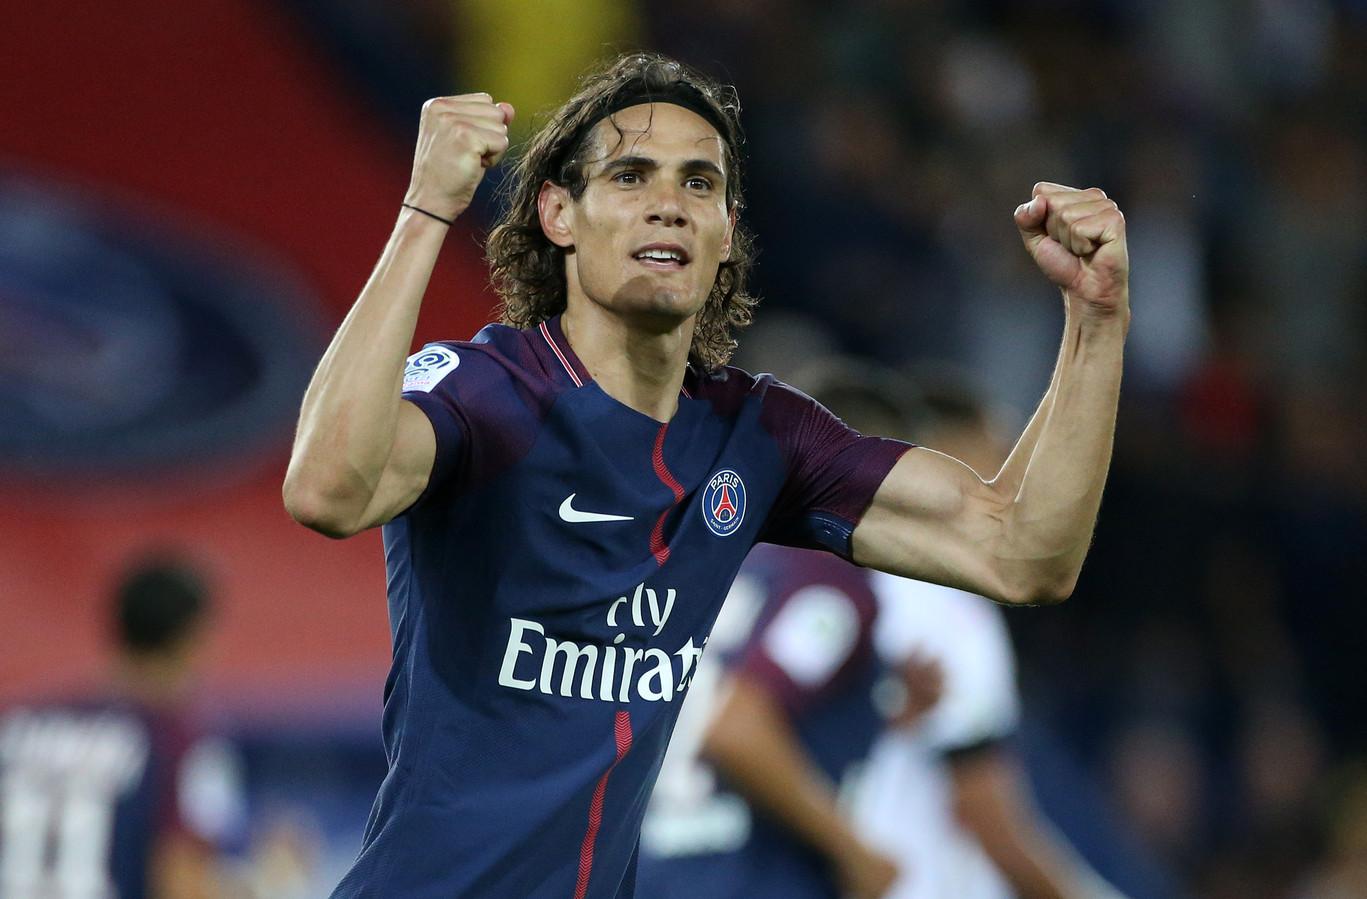 Edinson Cavani in het shirt van Paris Saint-Germain.